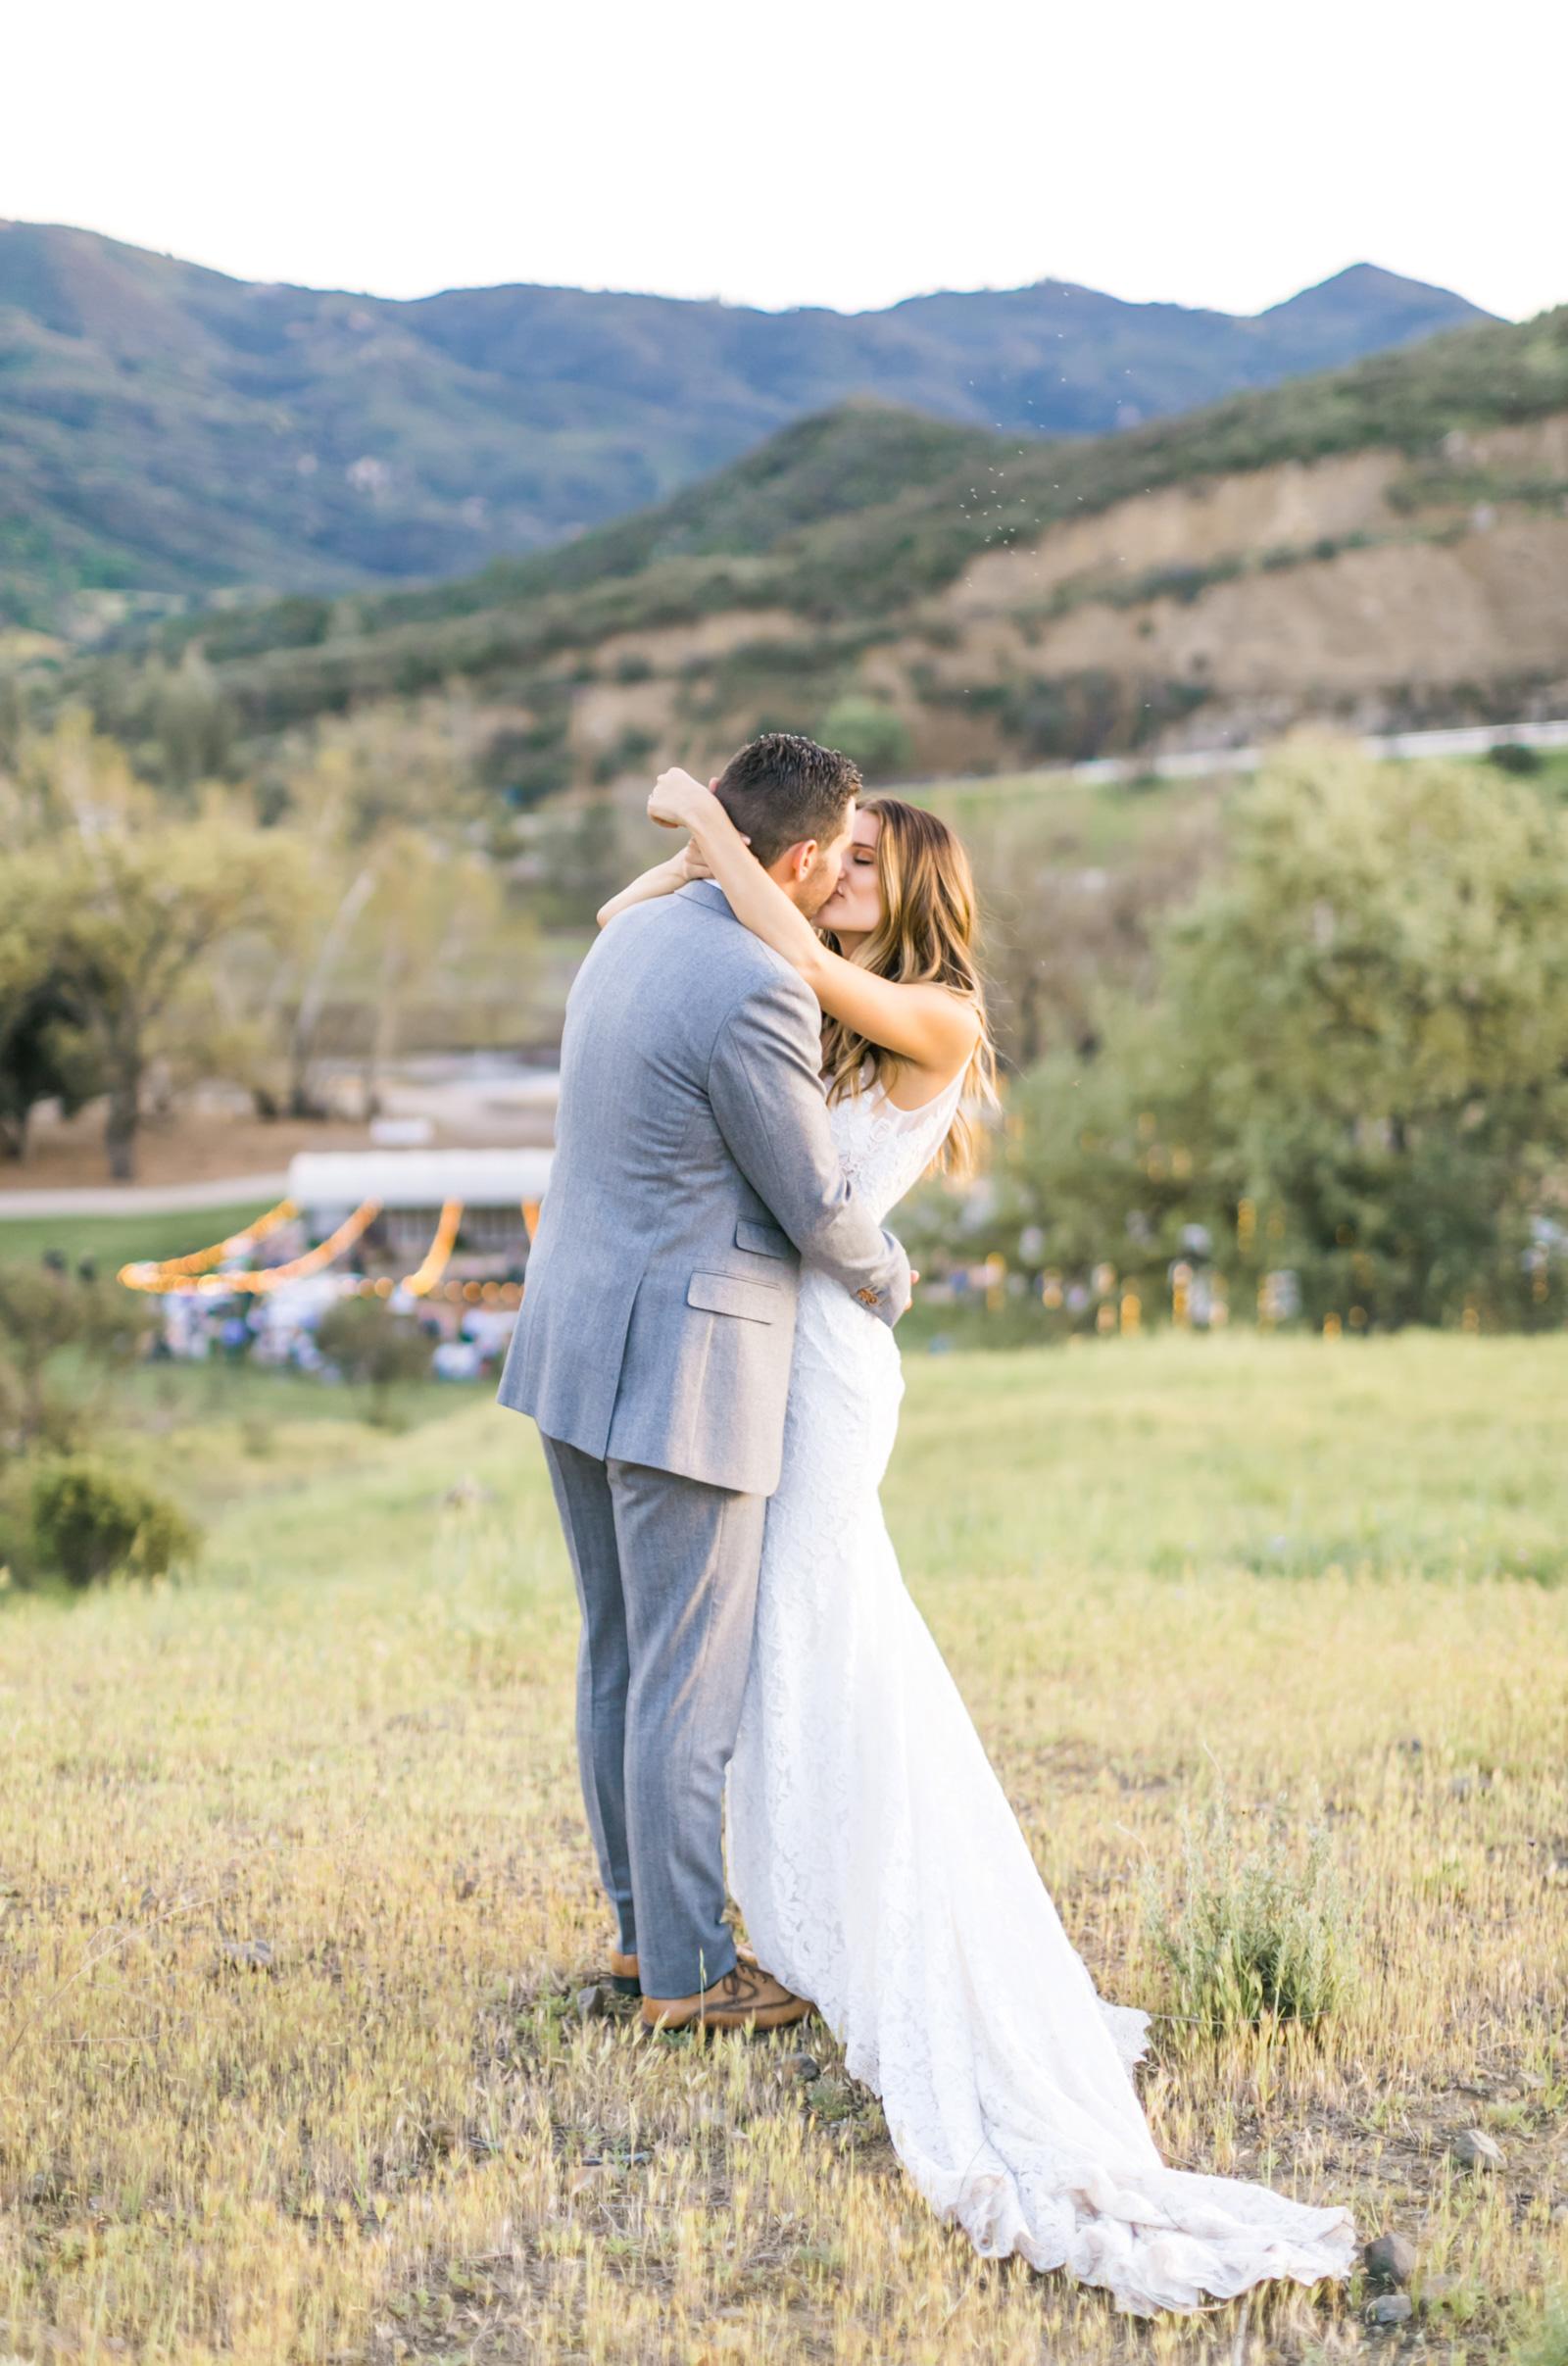 Triunfo-Creek-Malibu-Wedding-Photographer-Natalie-Schutt-Photography_09.jpg